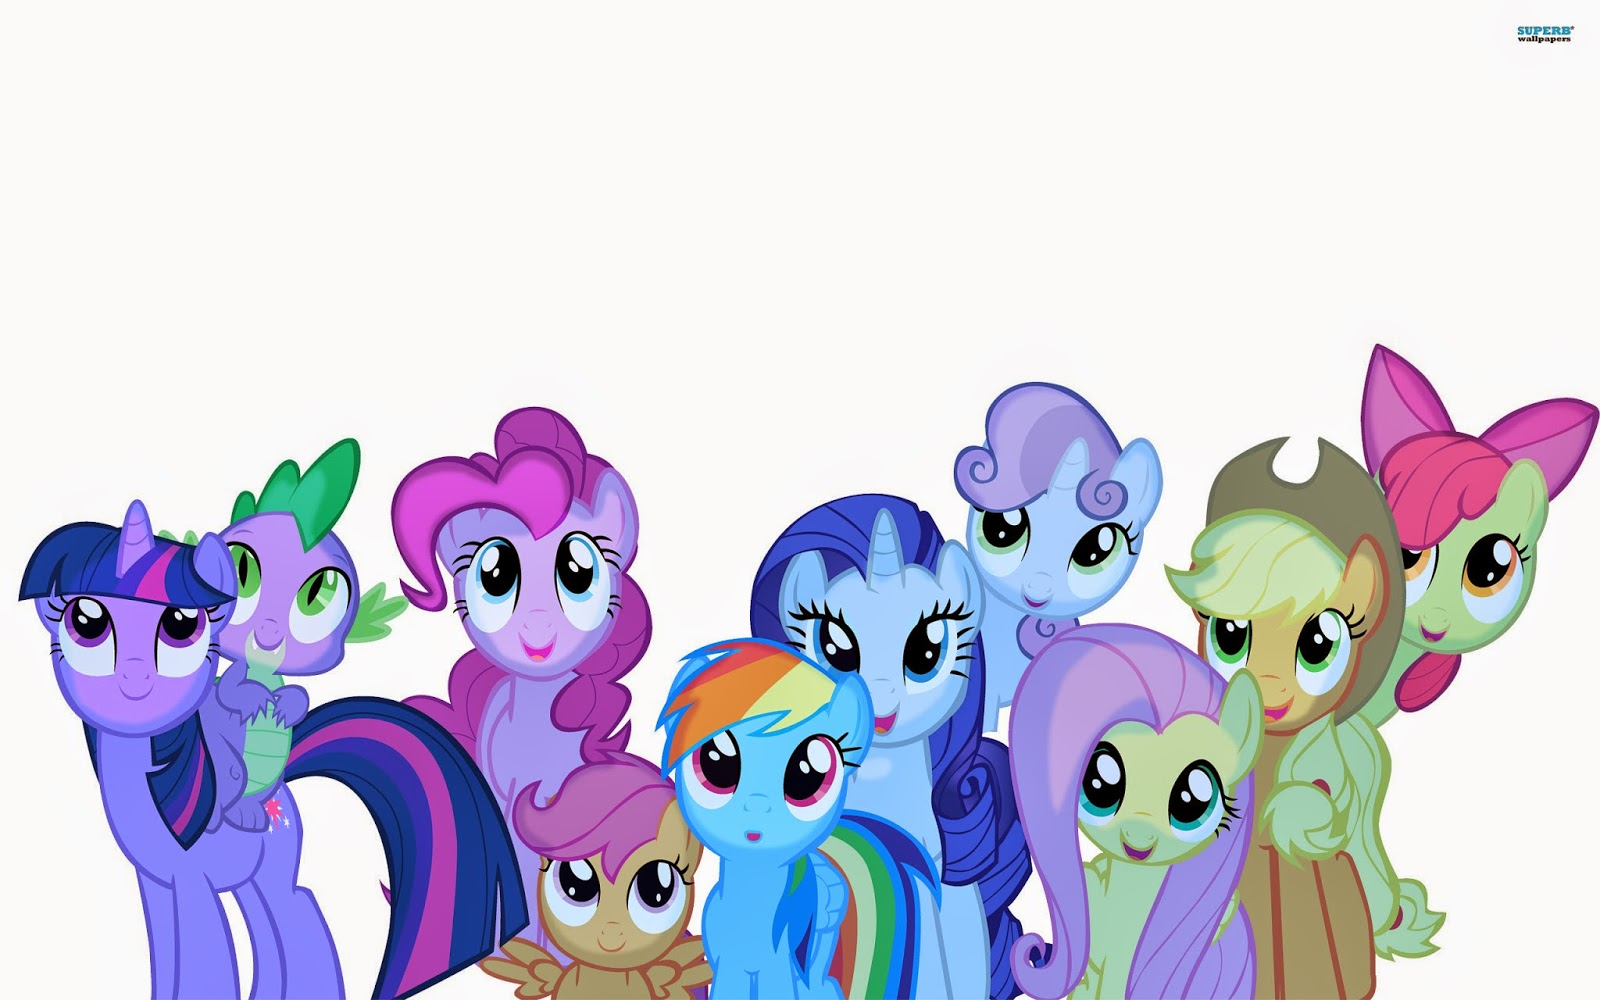 Kumpulan Gambar My Little Pony Friendship Is Magic